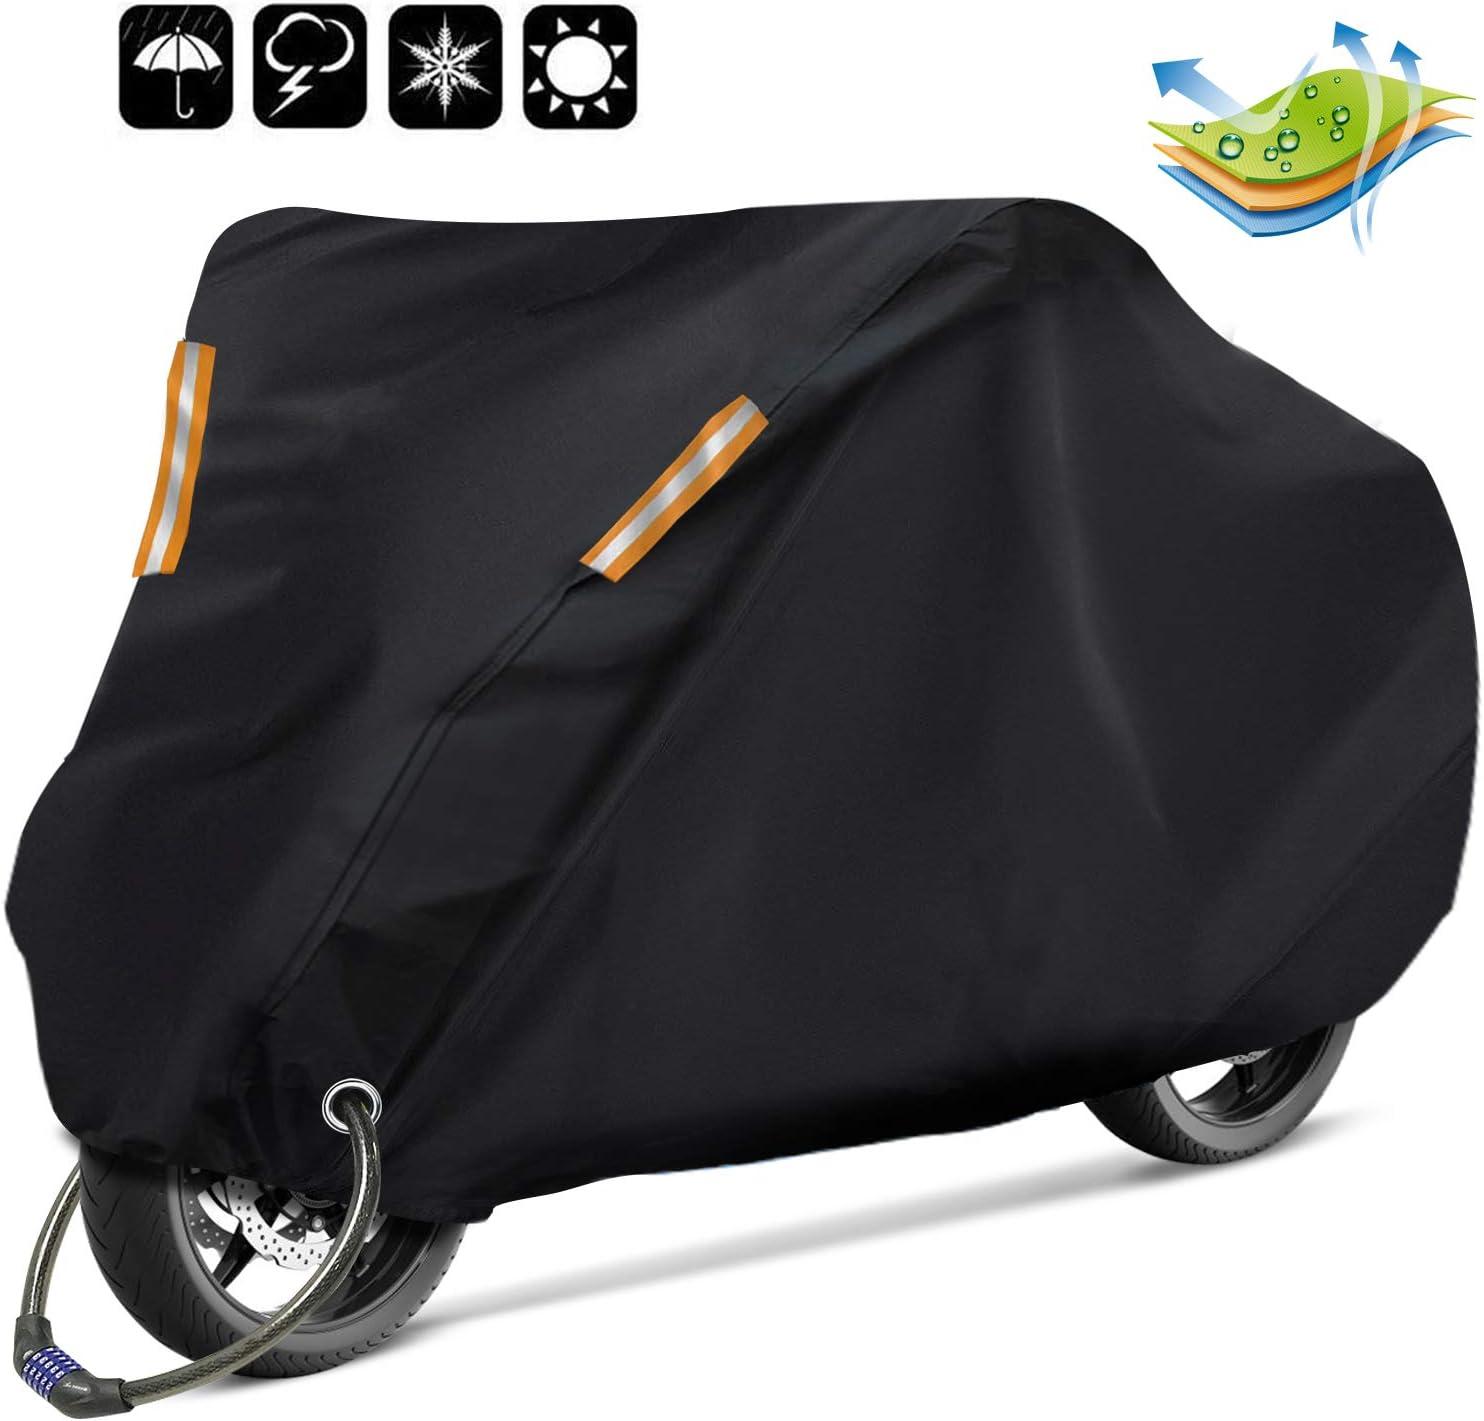 Ratel Motorbike Cover Auto